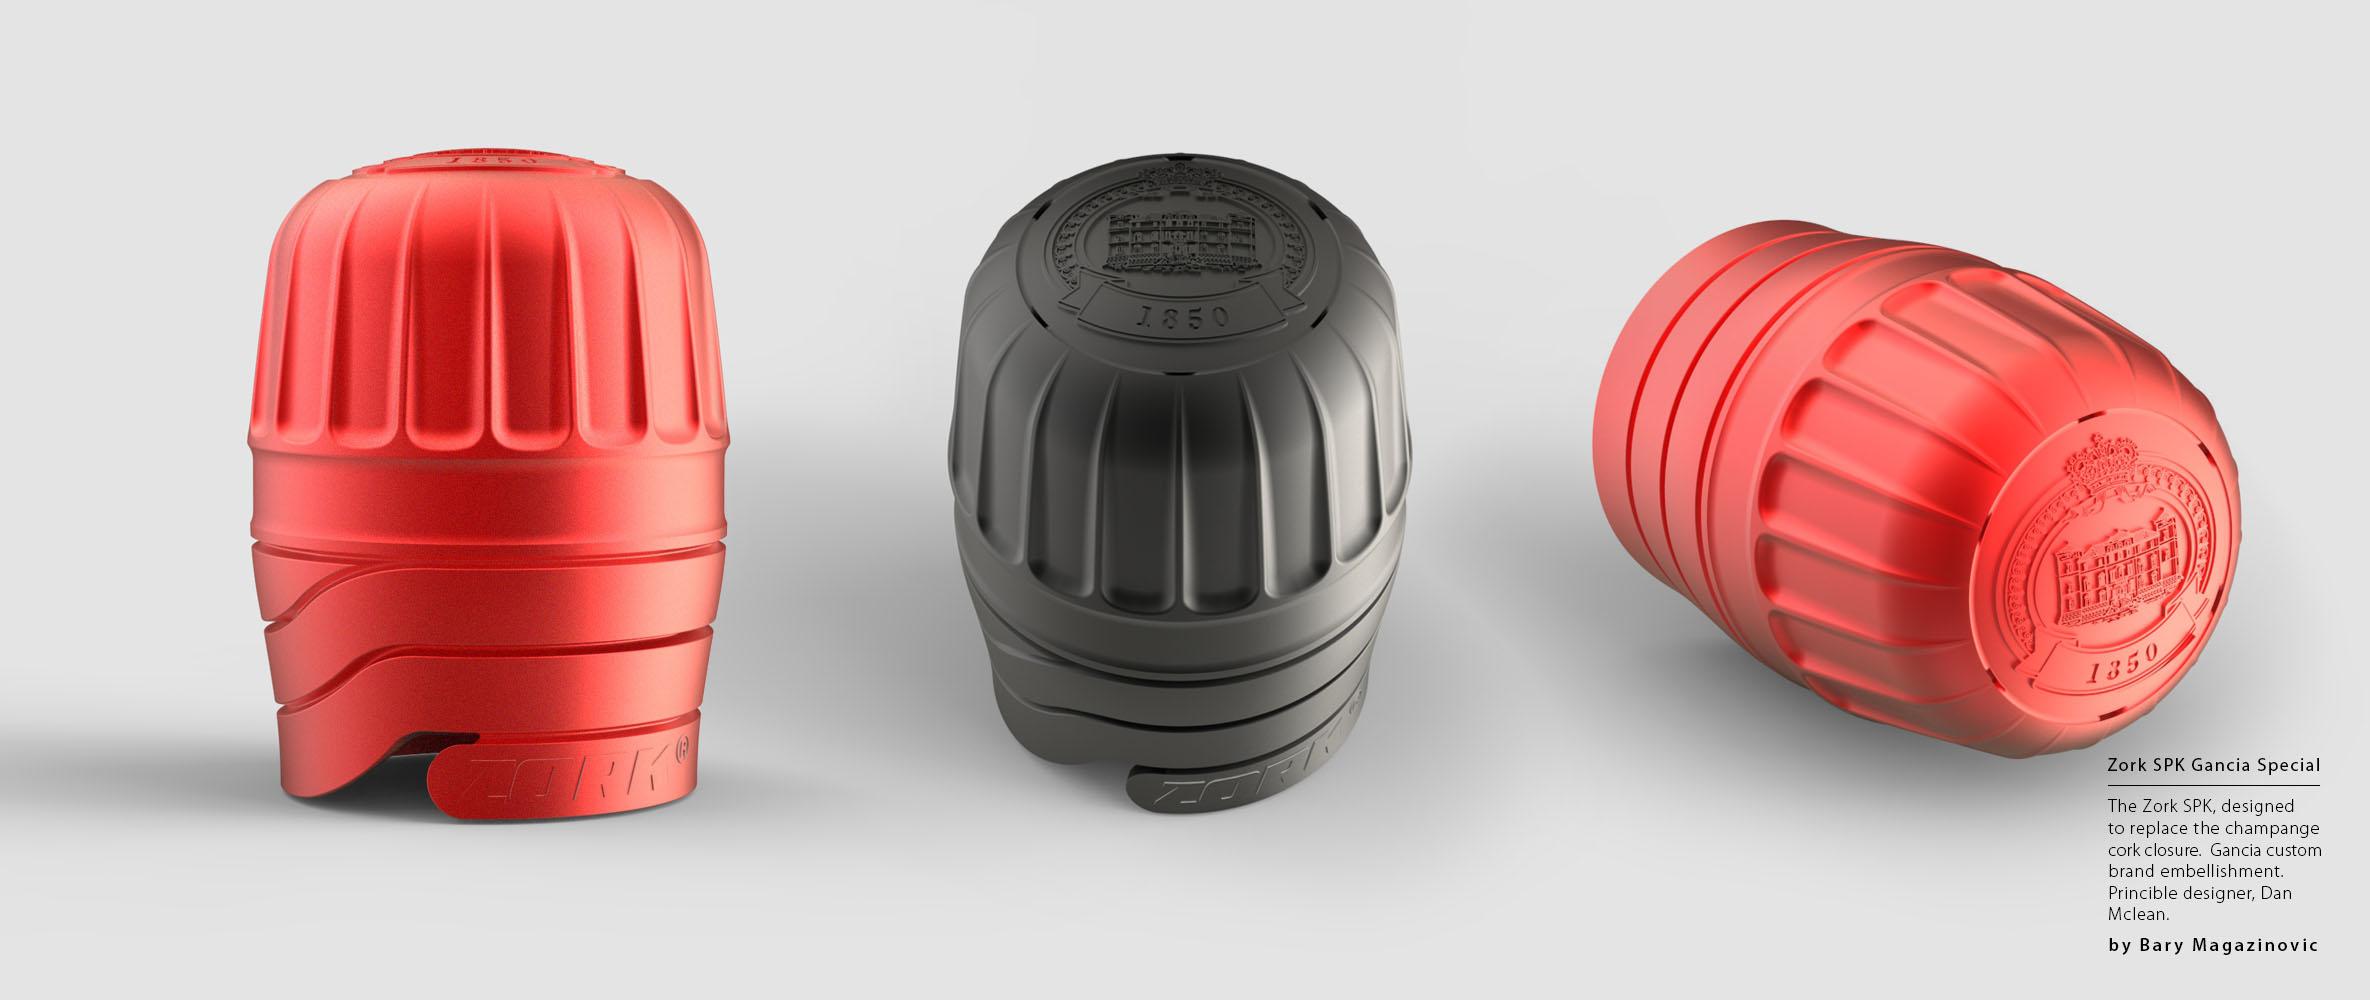 Australian Product Design Industrial Design SPK sparkling Champagne logo Gancia by Barry Magazinovic